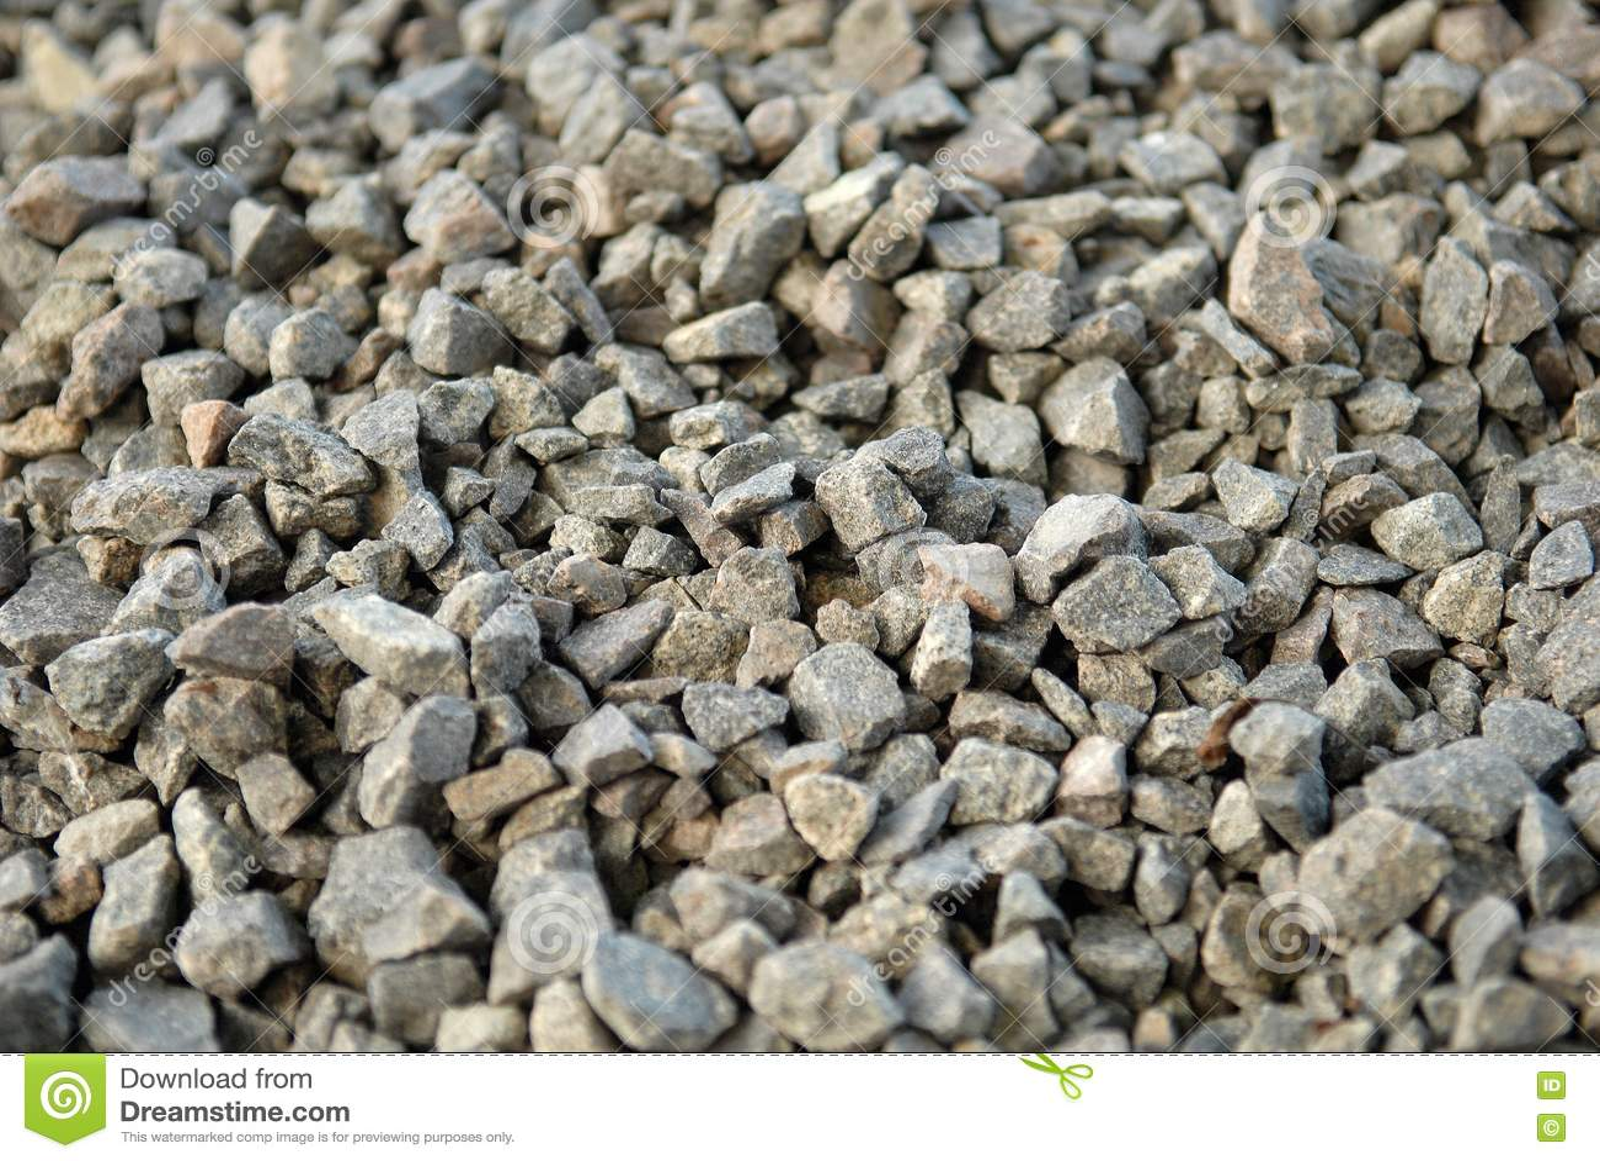 Textura de la grava del granito materiales de construcci n - Material de construccion en valencia ...